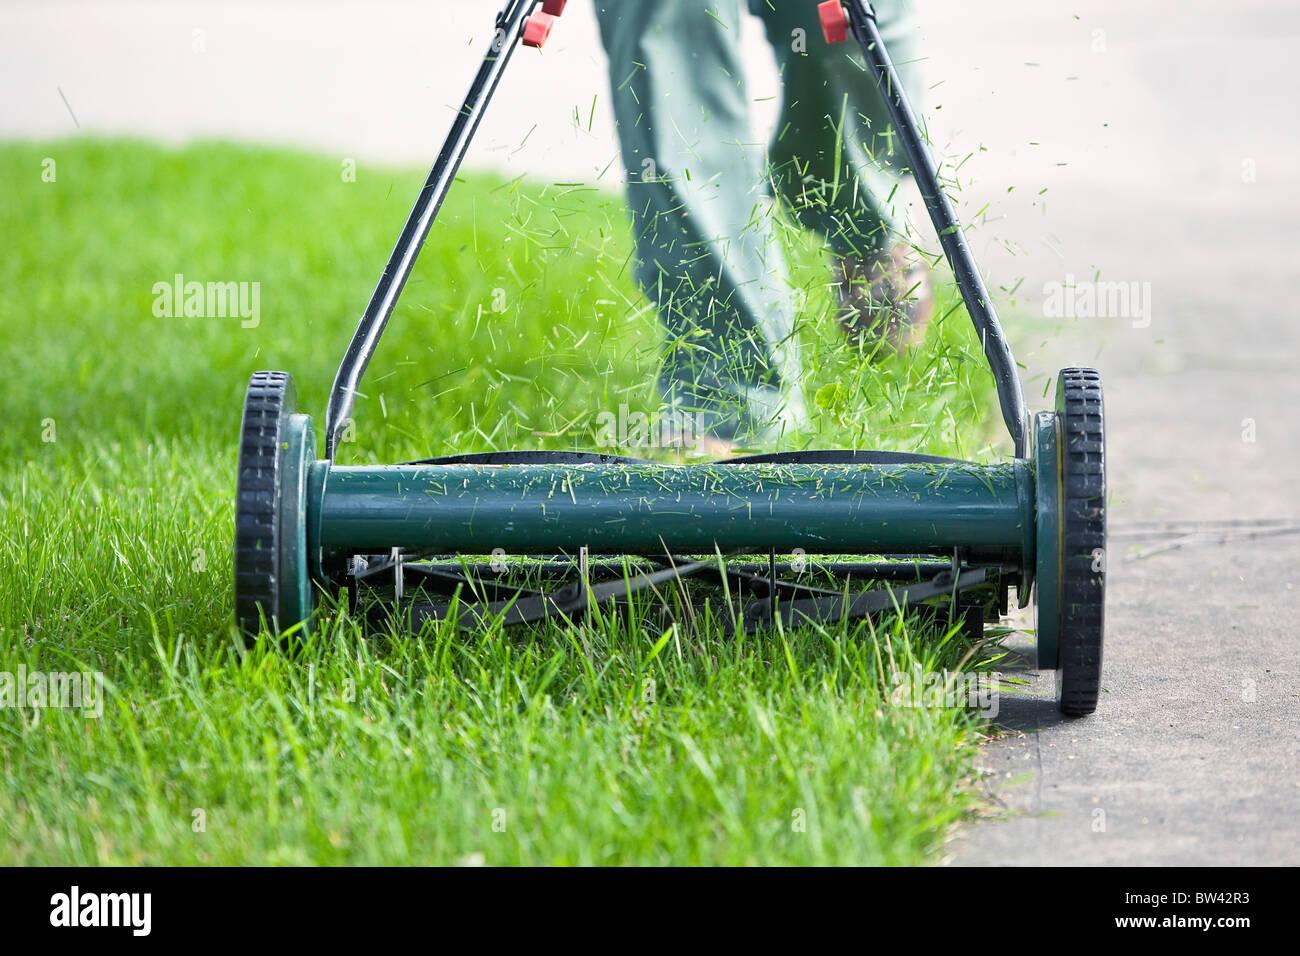 Woman cutting grass with an environmentally friendly push lawn mower, Winnipeg, Manitoba, Canada - Stock Image